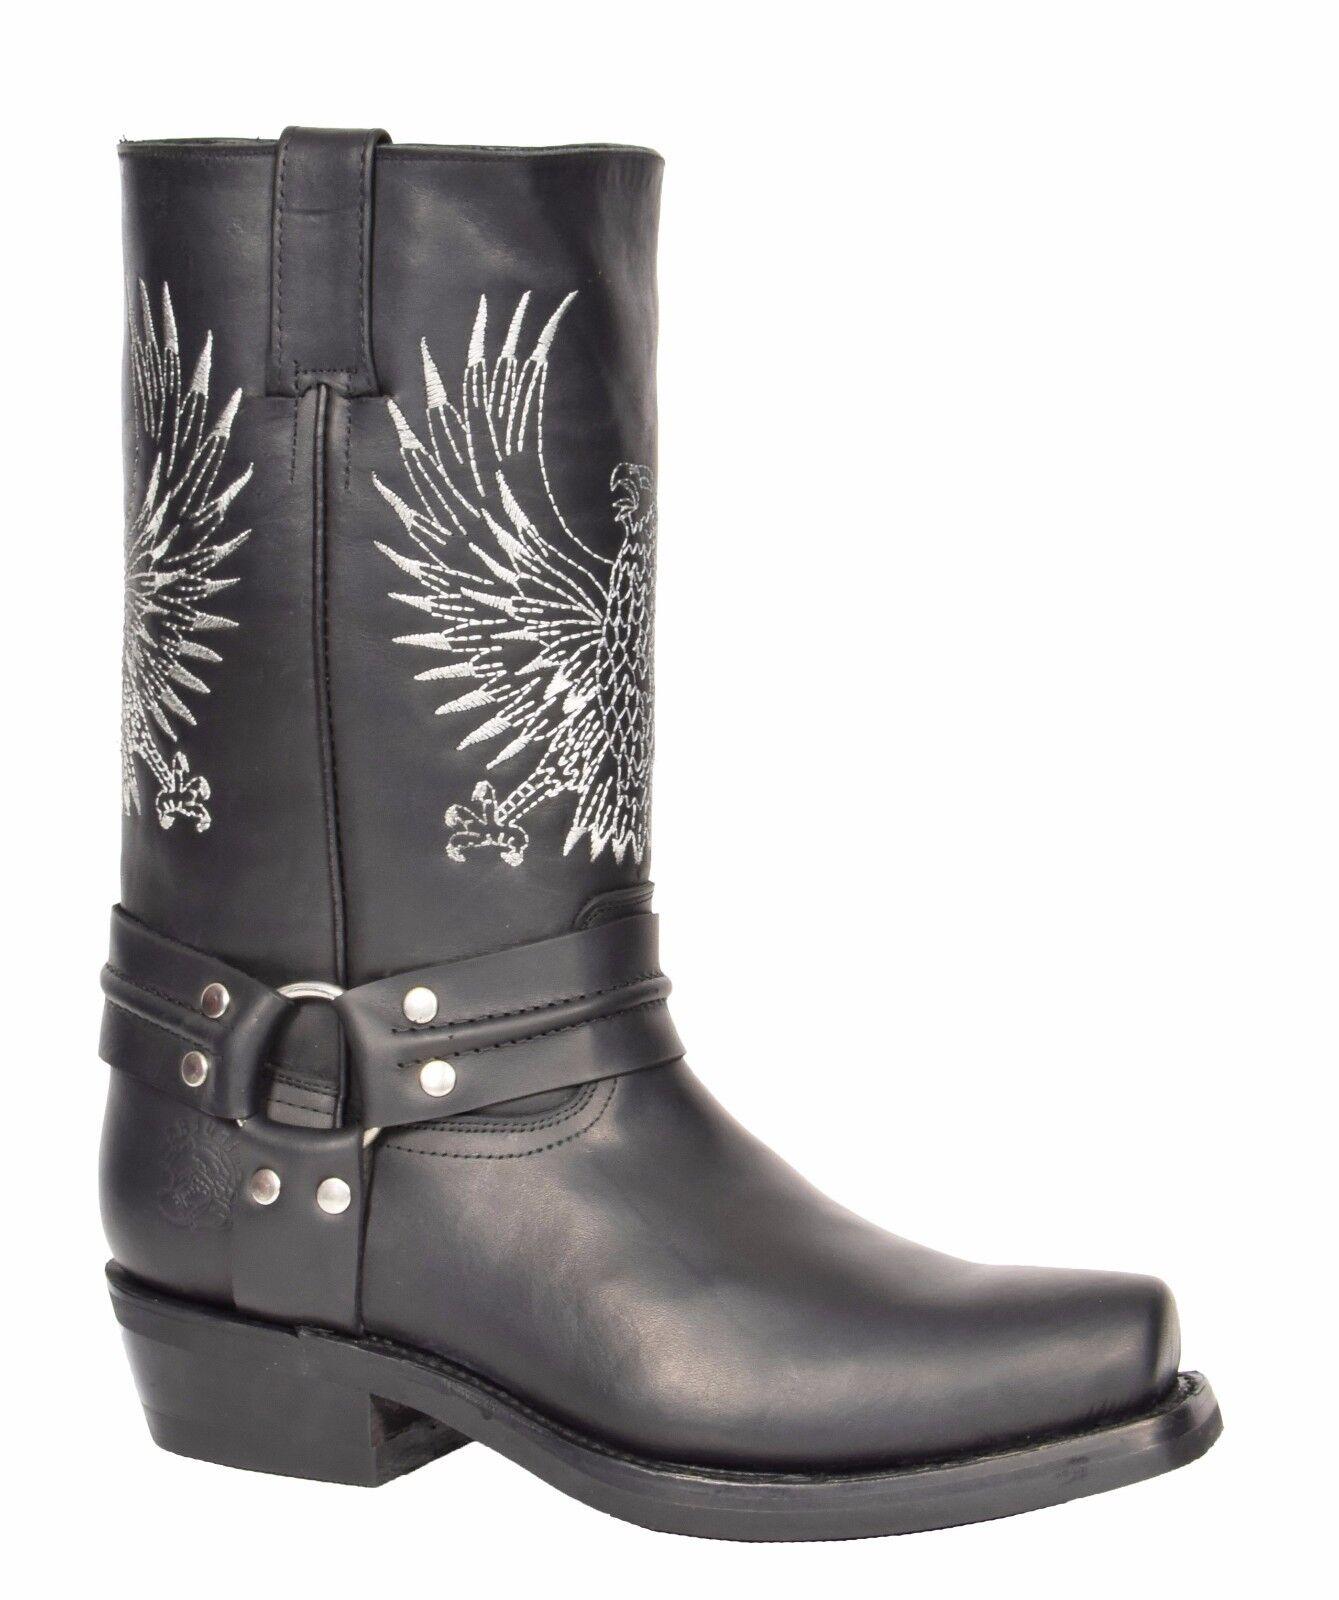 Da Uomo Nera In Pelle Cowboy Biker Boots Infilare Square Punta Stivali Firmati Grinders